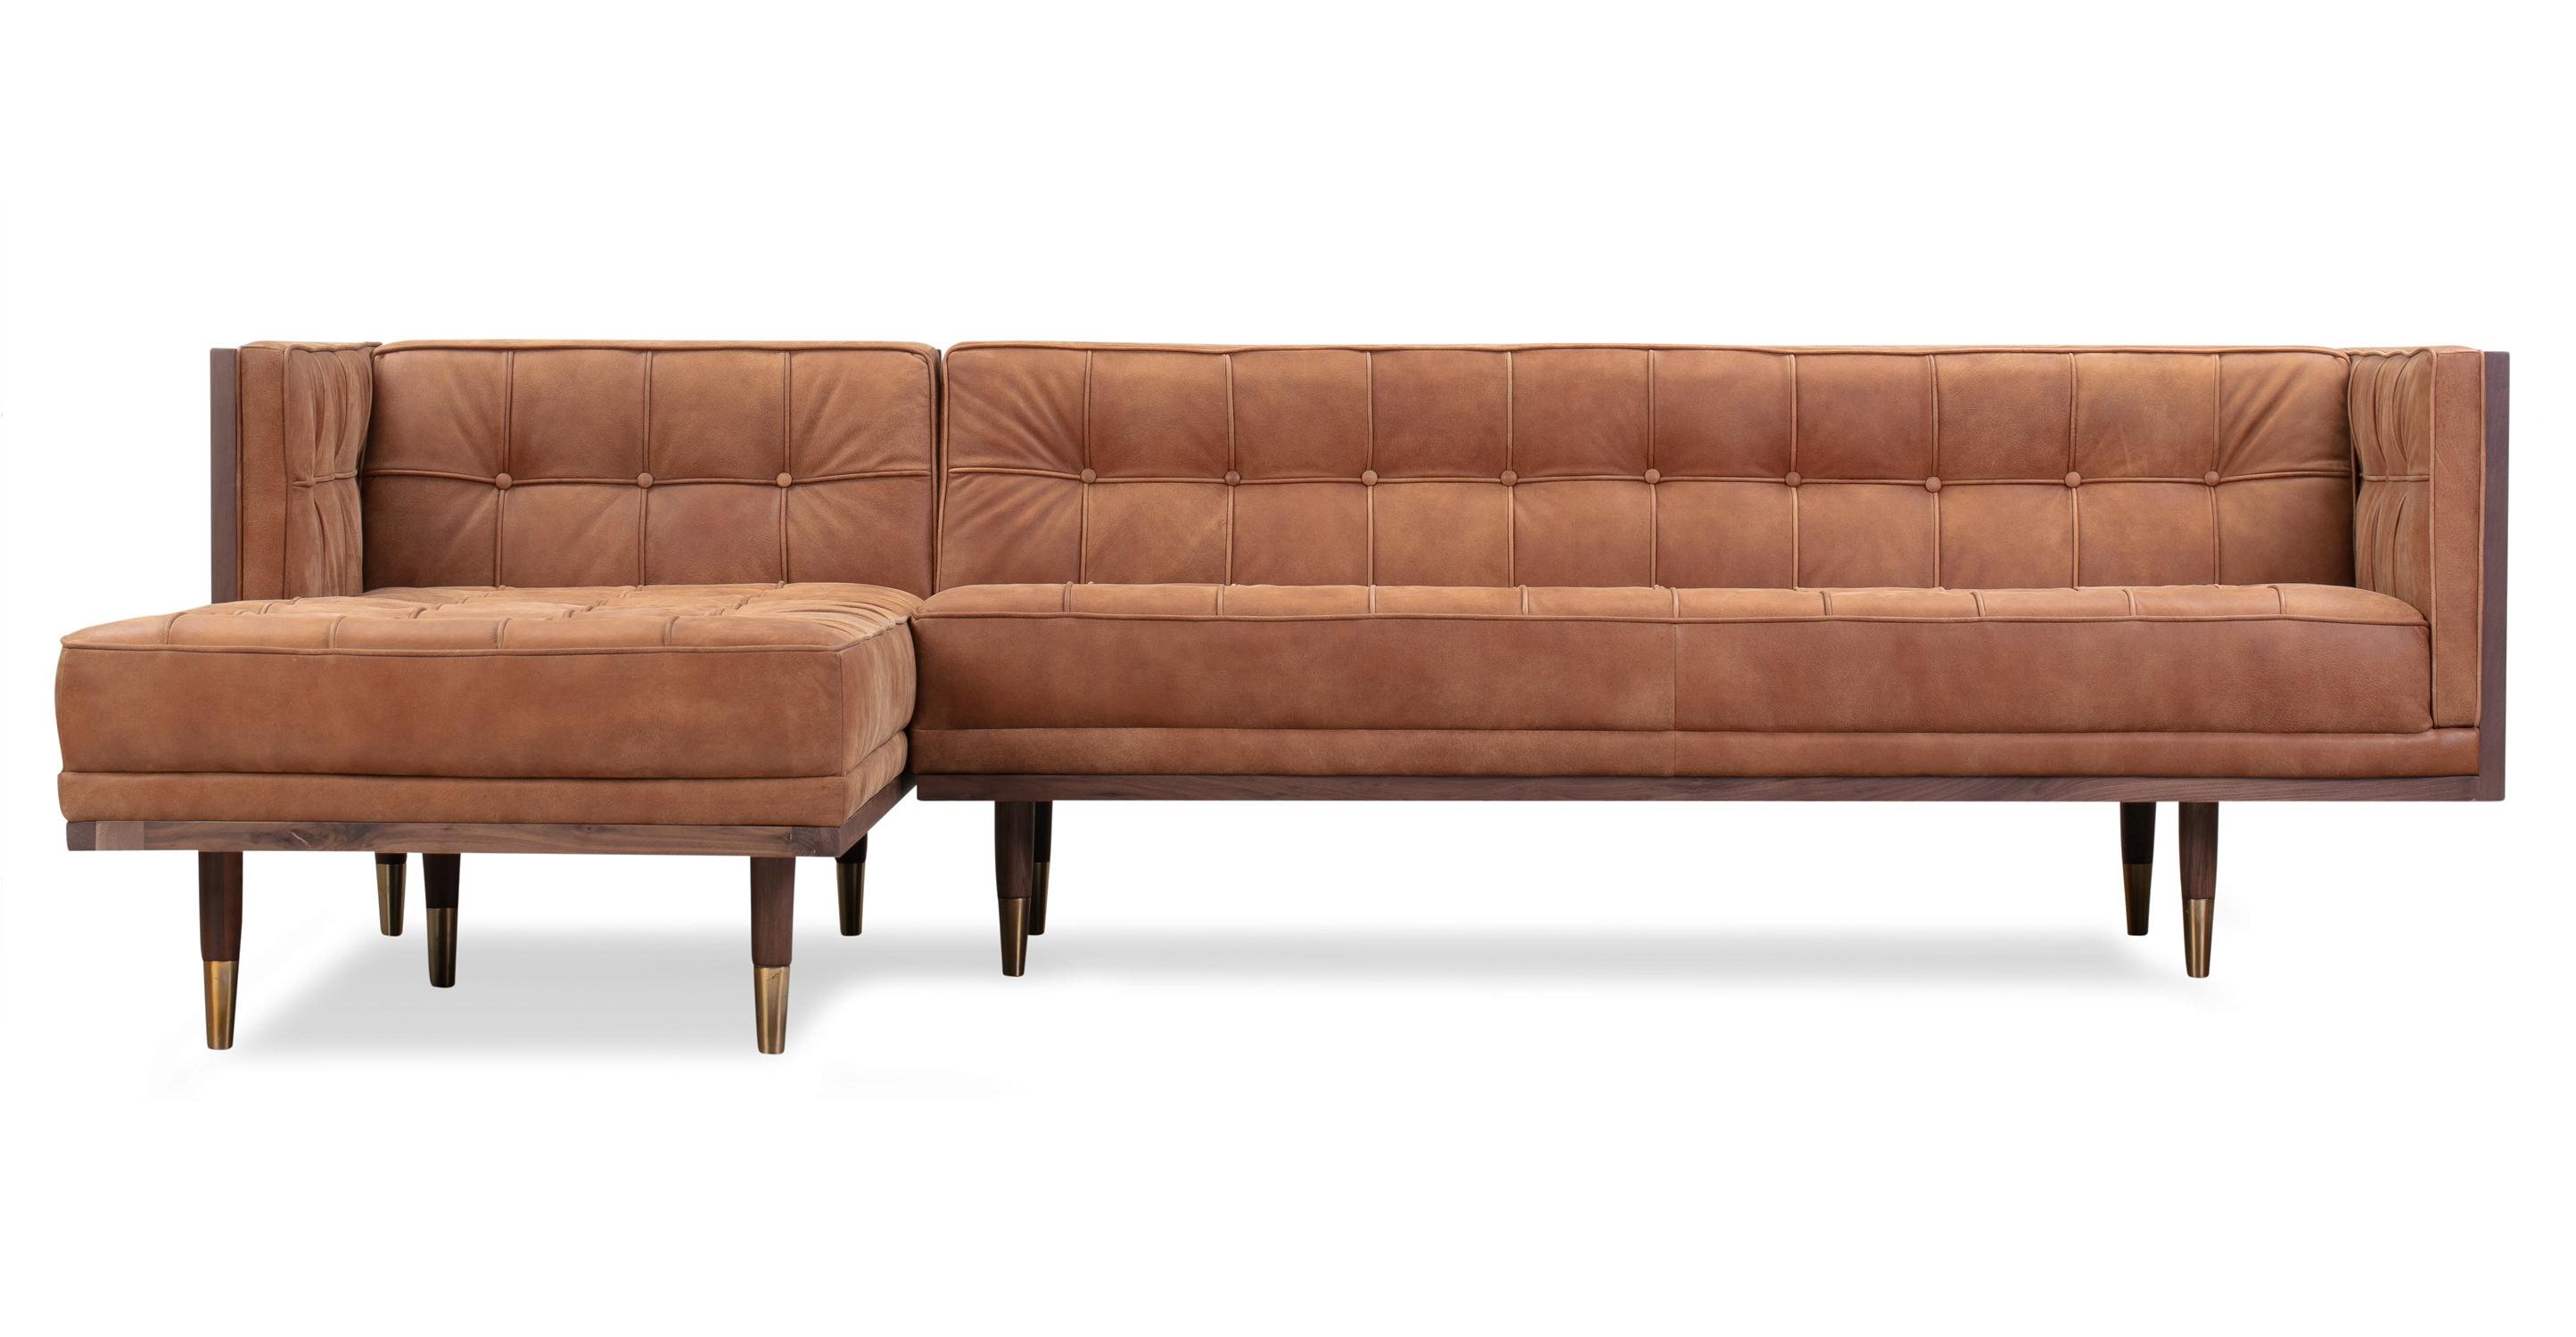 "Woodrow Box 100"" Sofa Sectional Left, Walnut/Cognac"